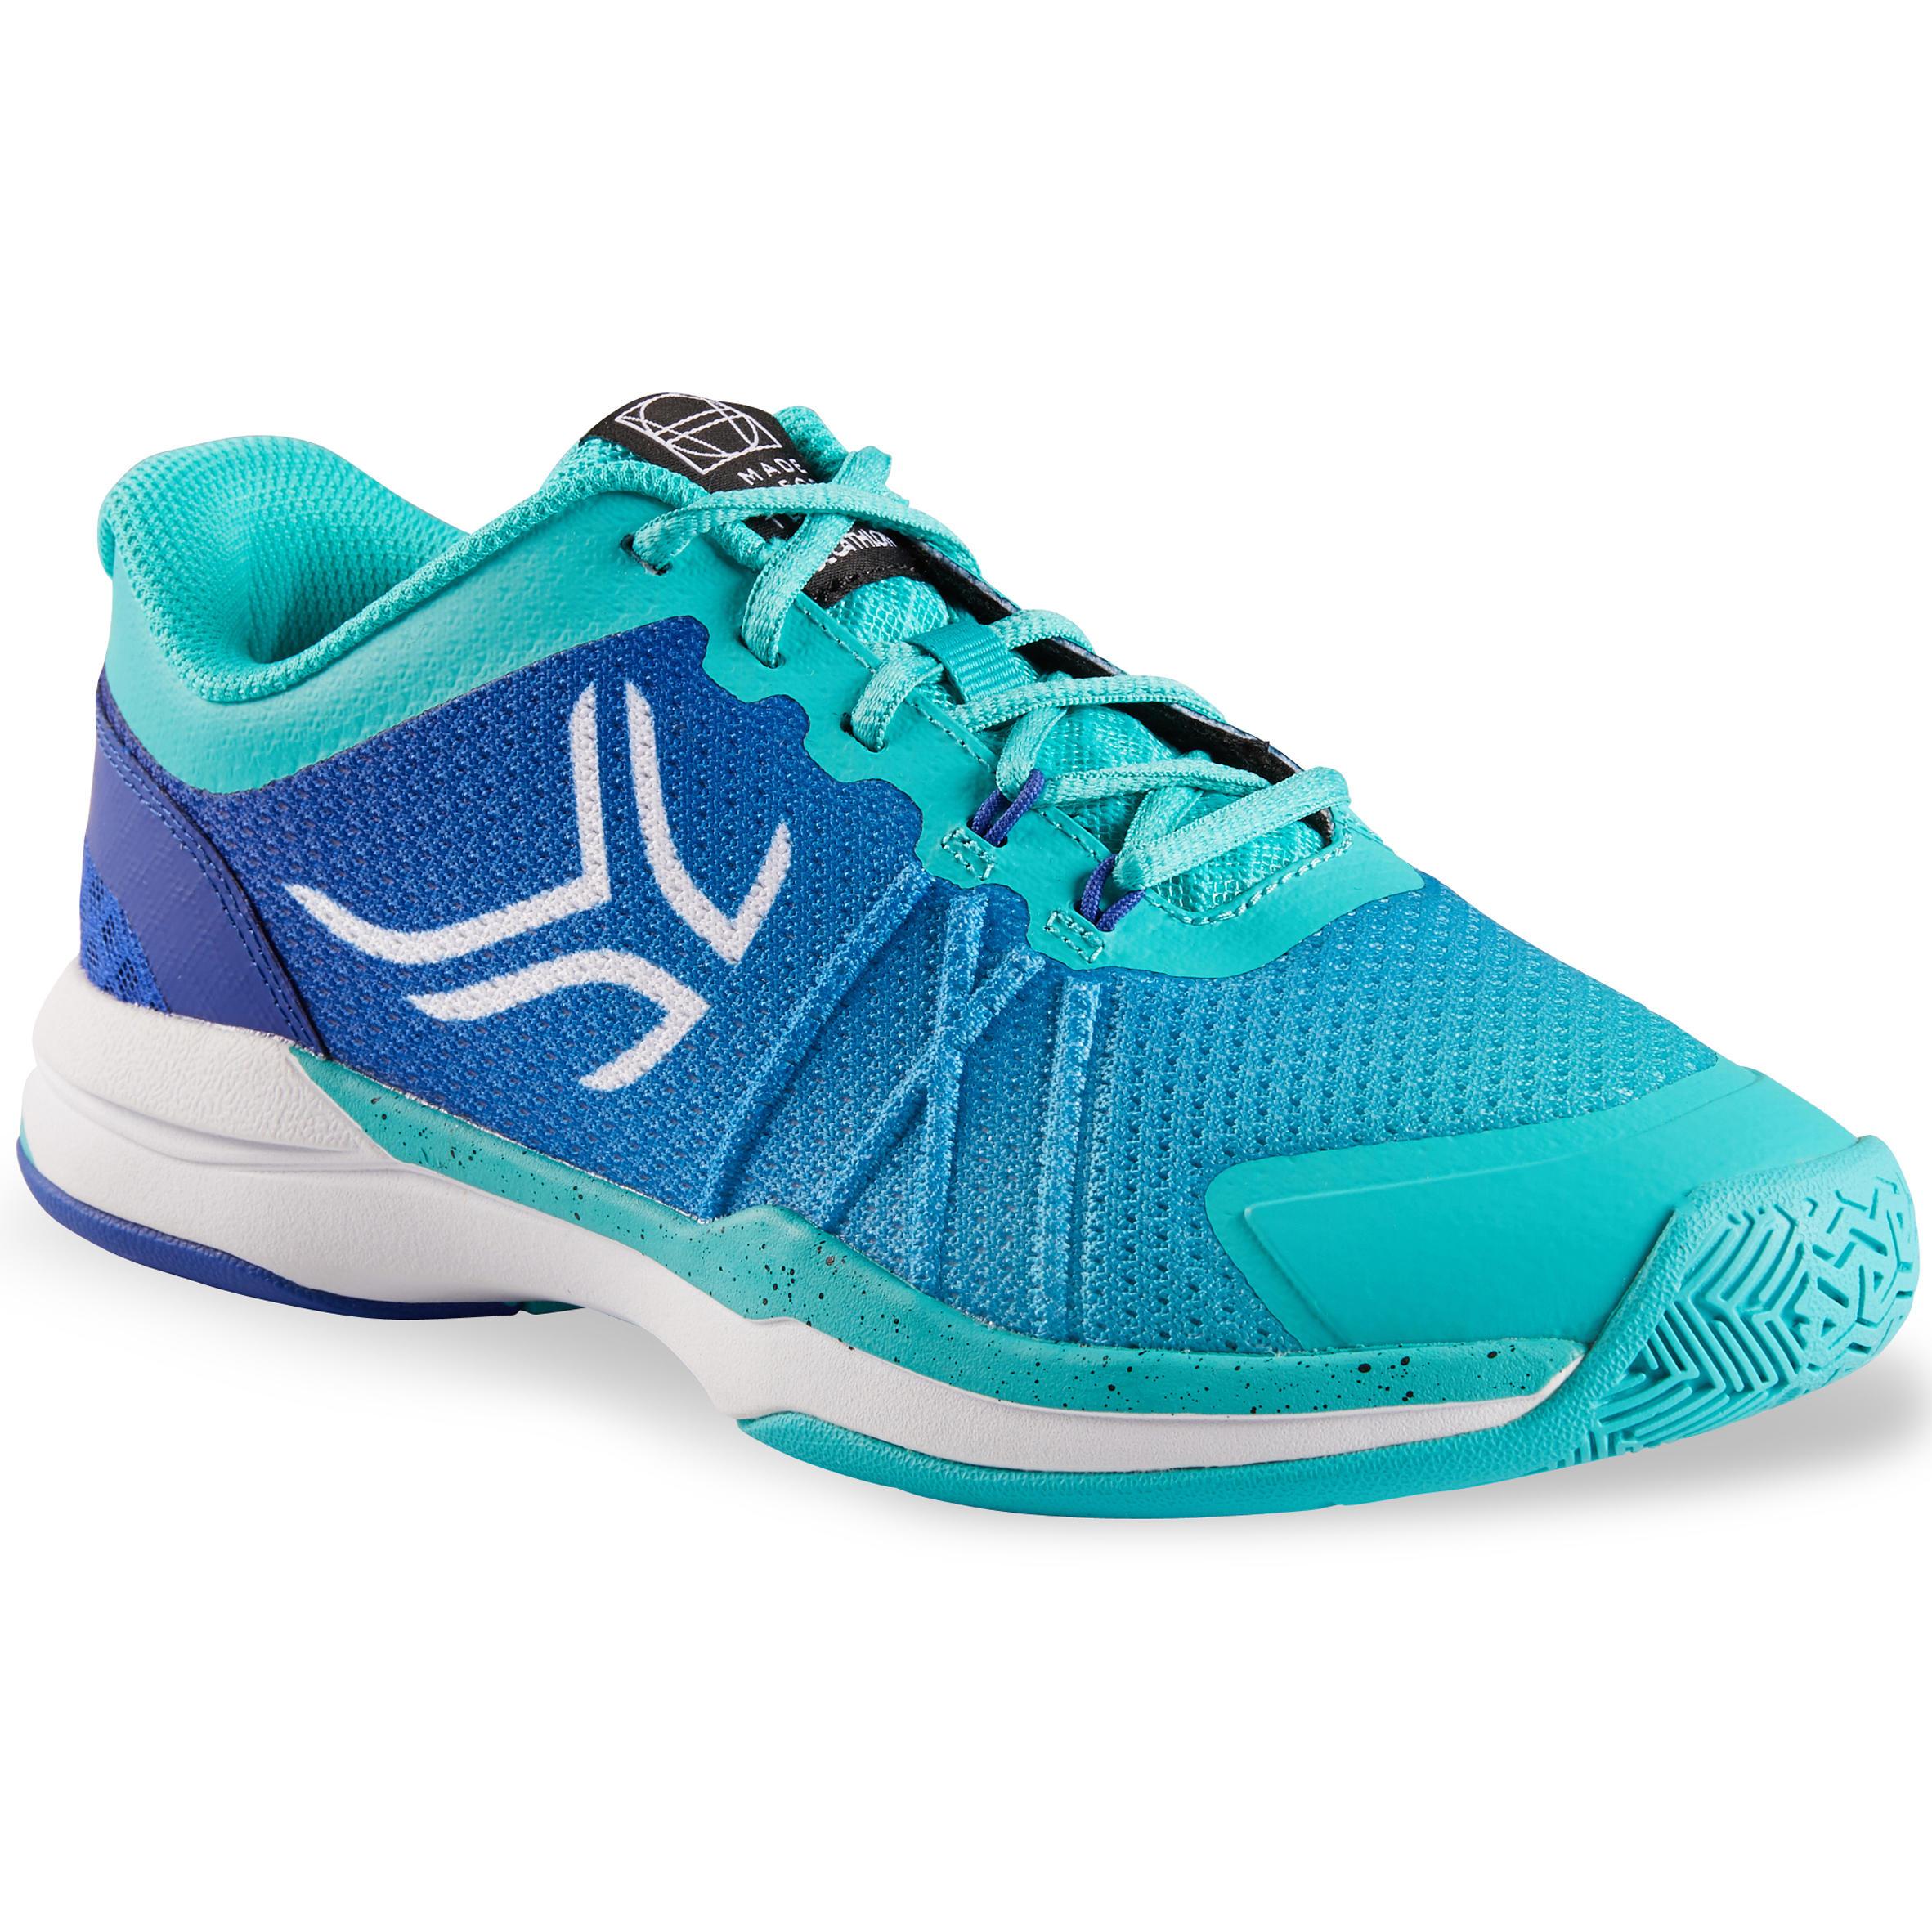 Artengo Tennisschoenen voor dames TS 590 turkoois